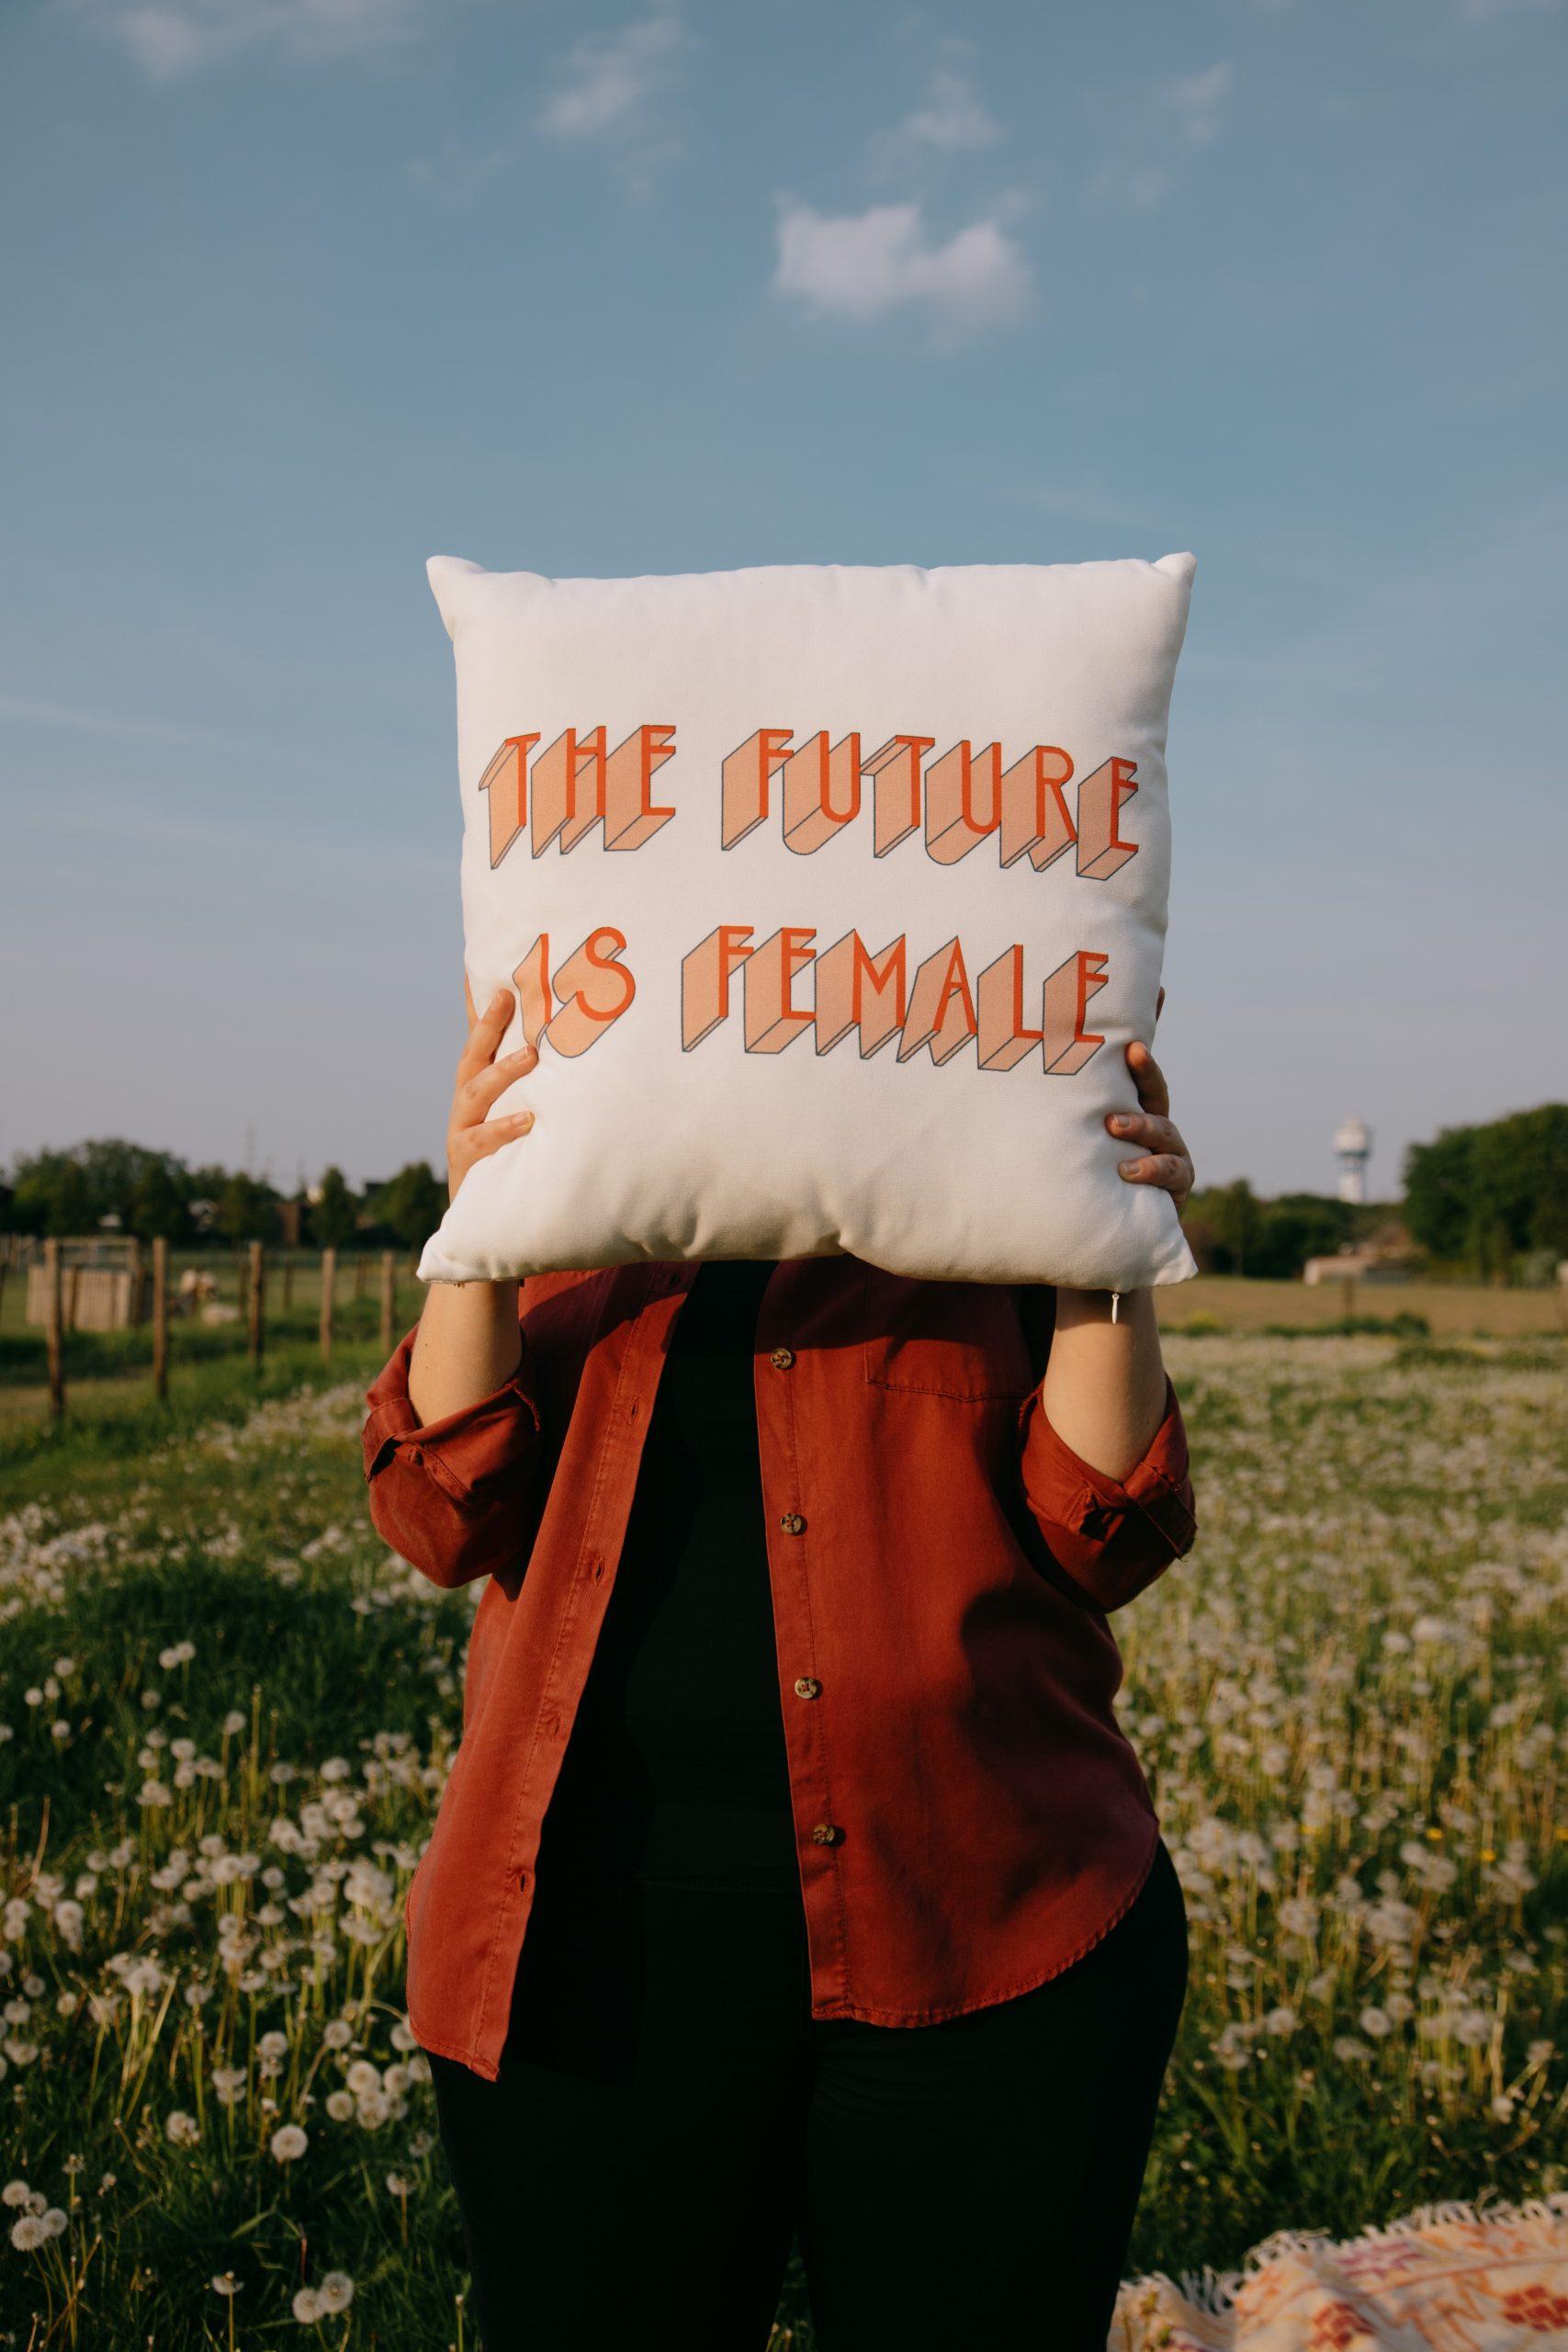 Zestig procent feminist